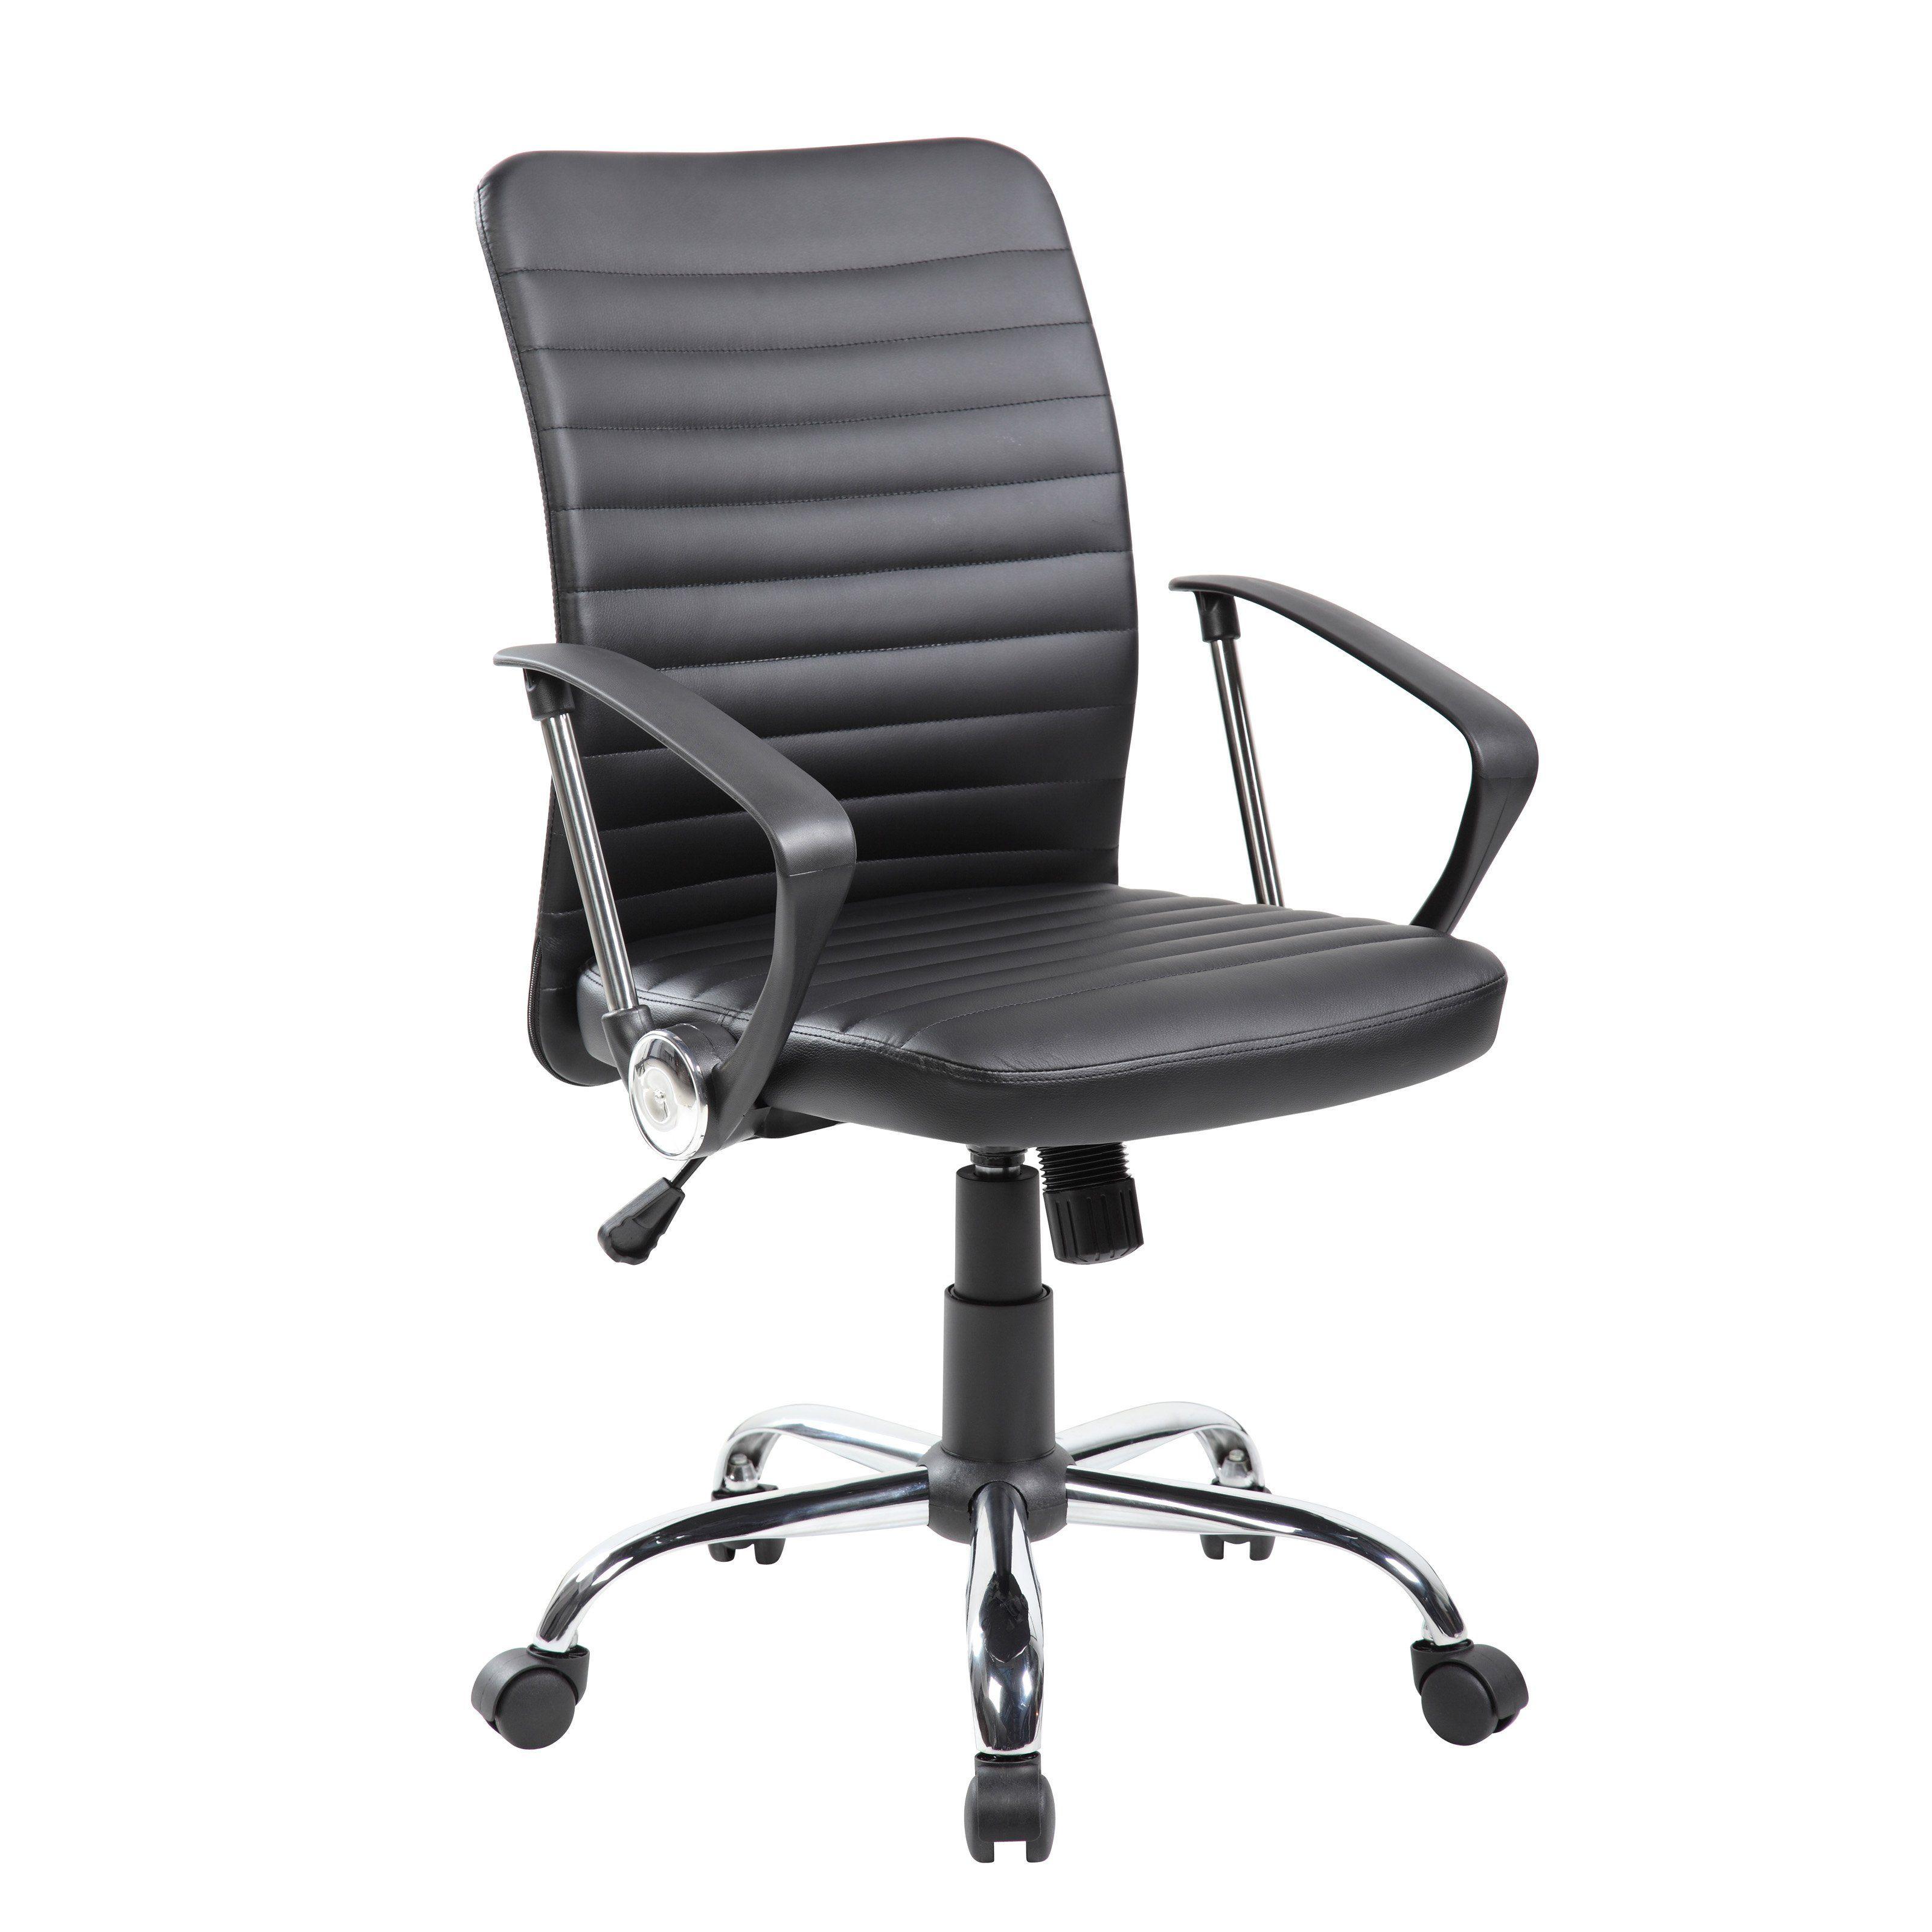 United Chair Industries Modern Ergonomic Office Task Chair